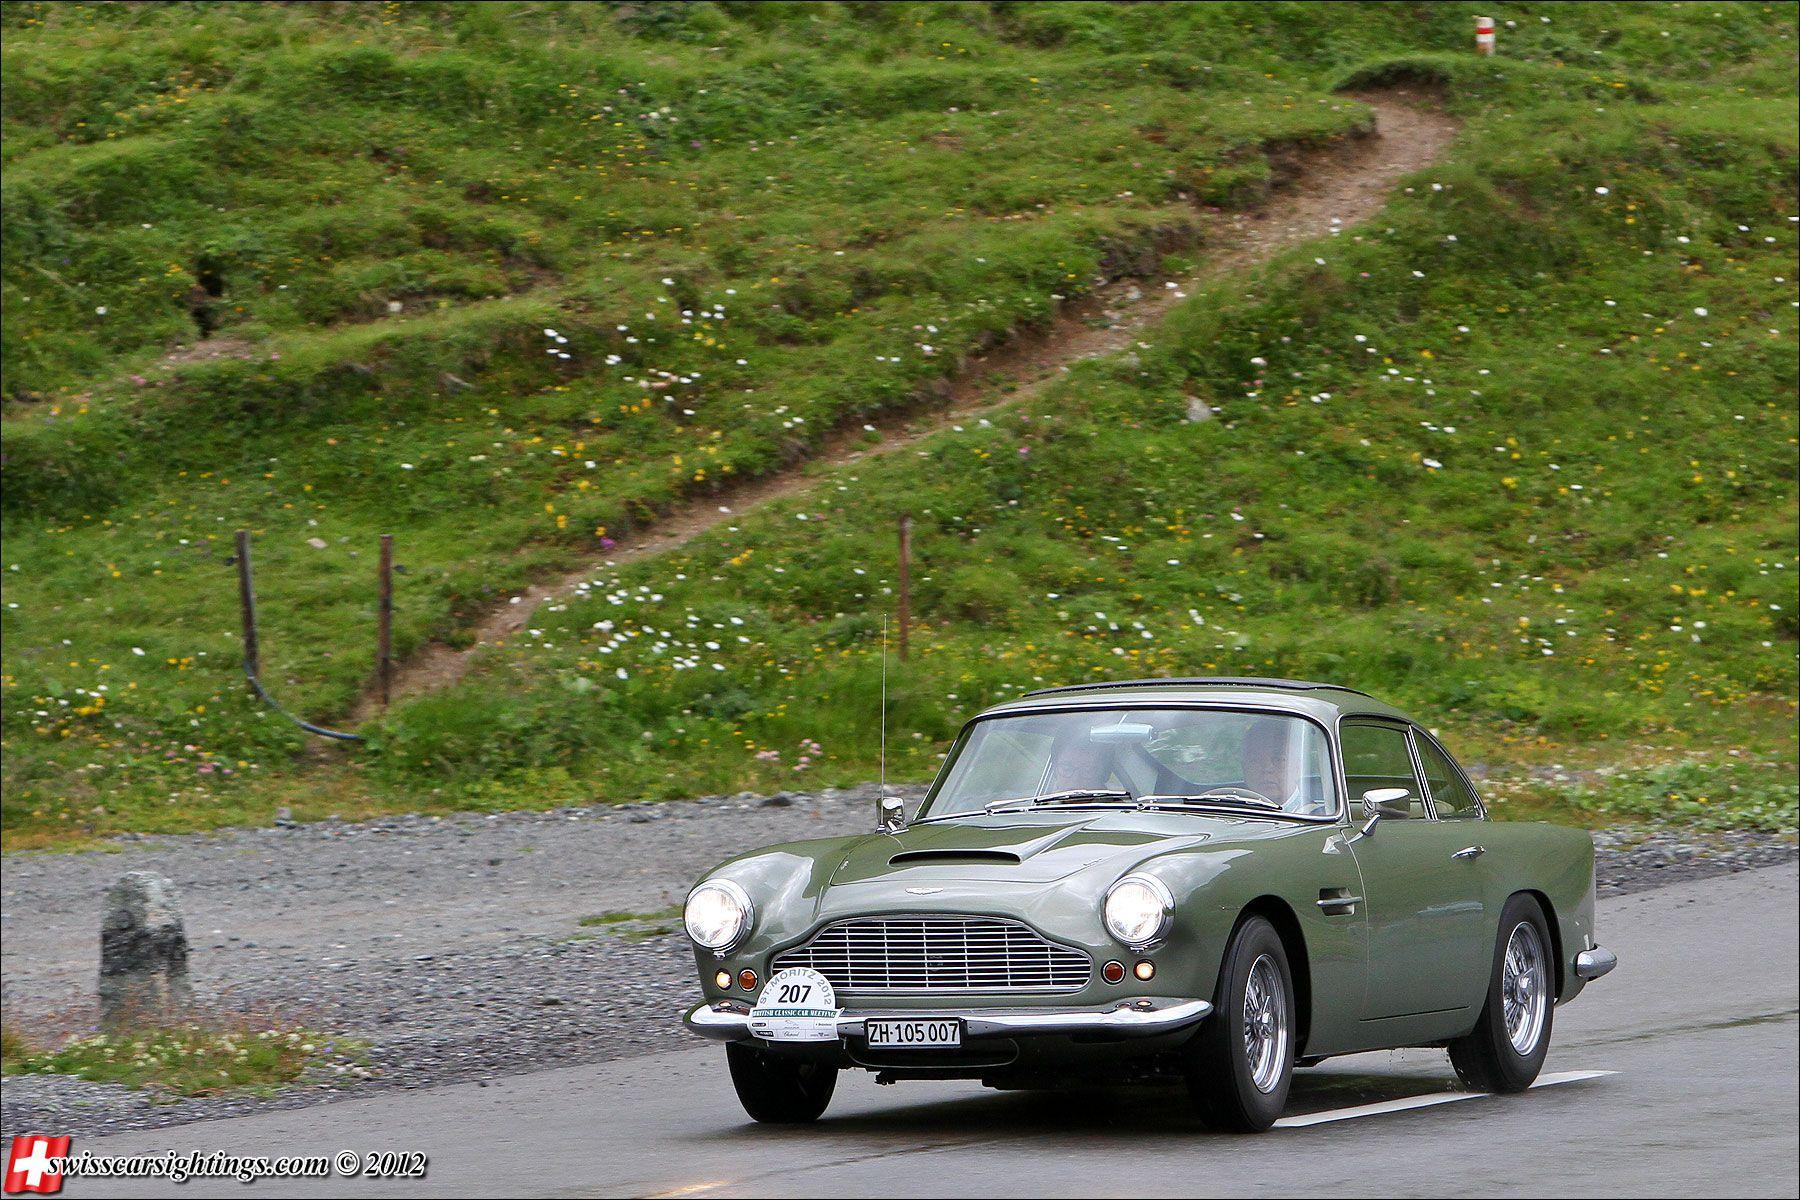 Aston Martin DB4 via swisscarsightings